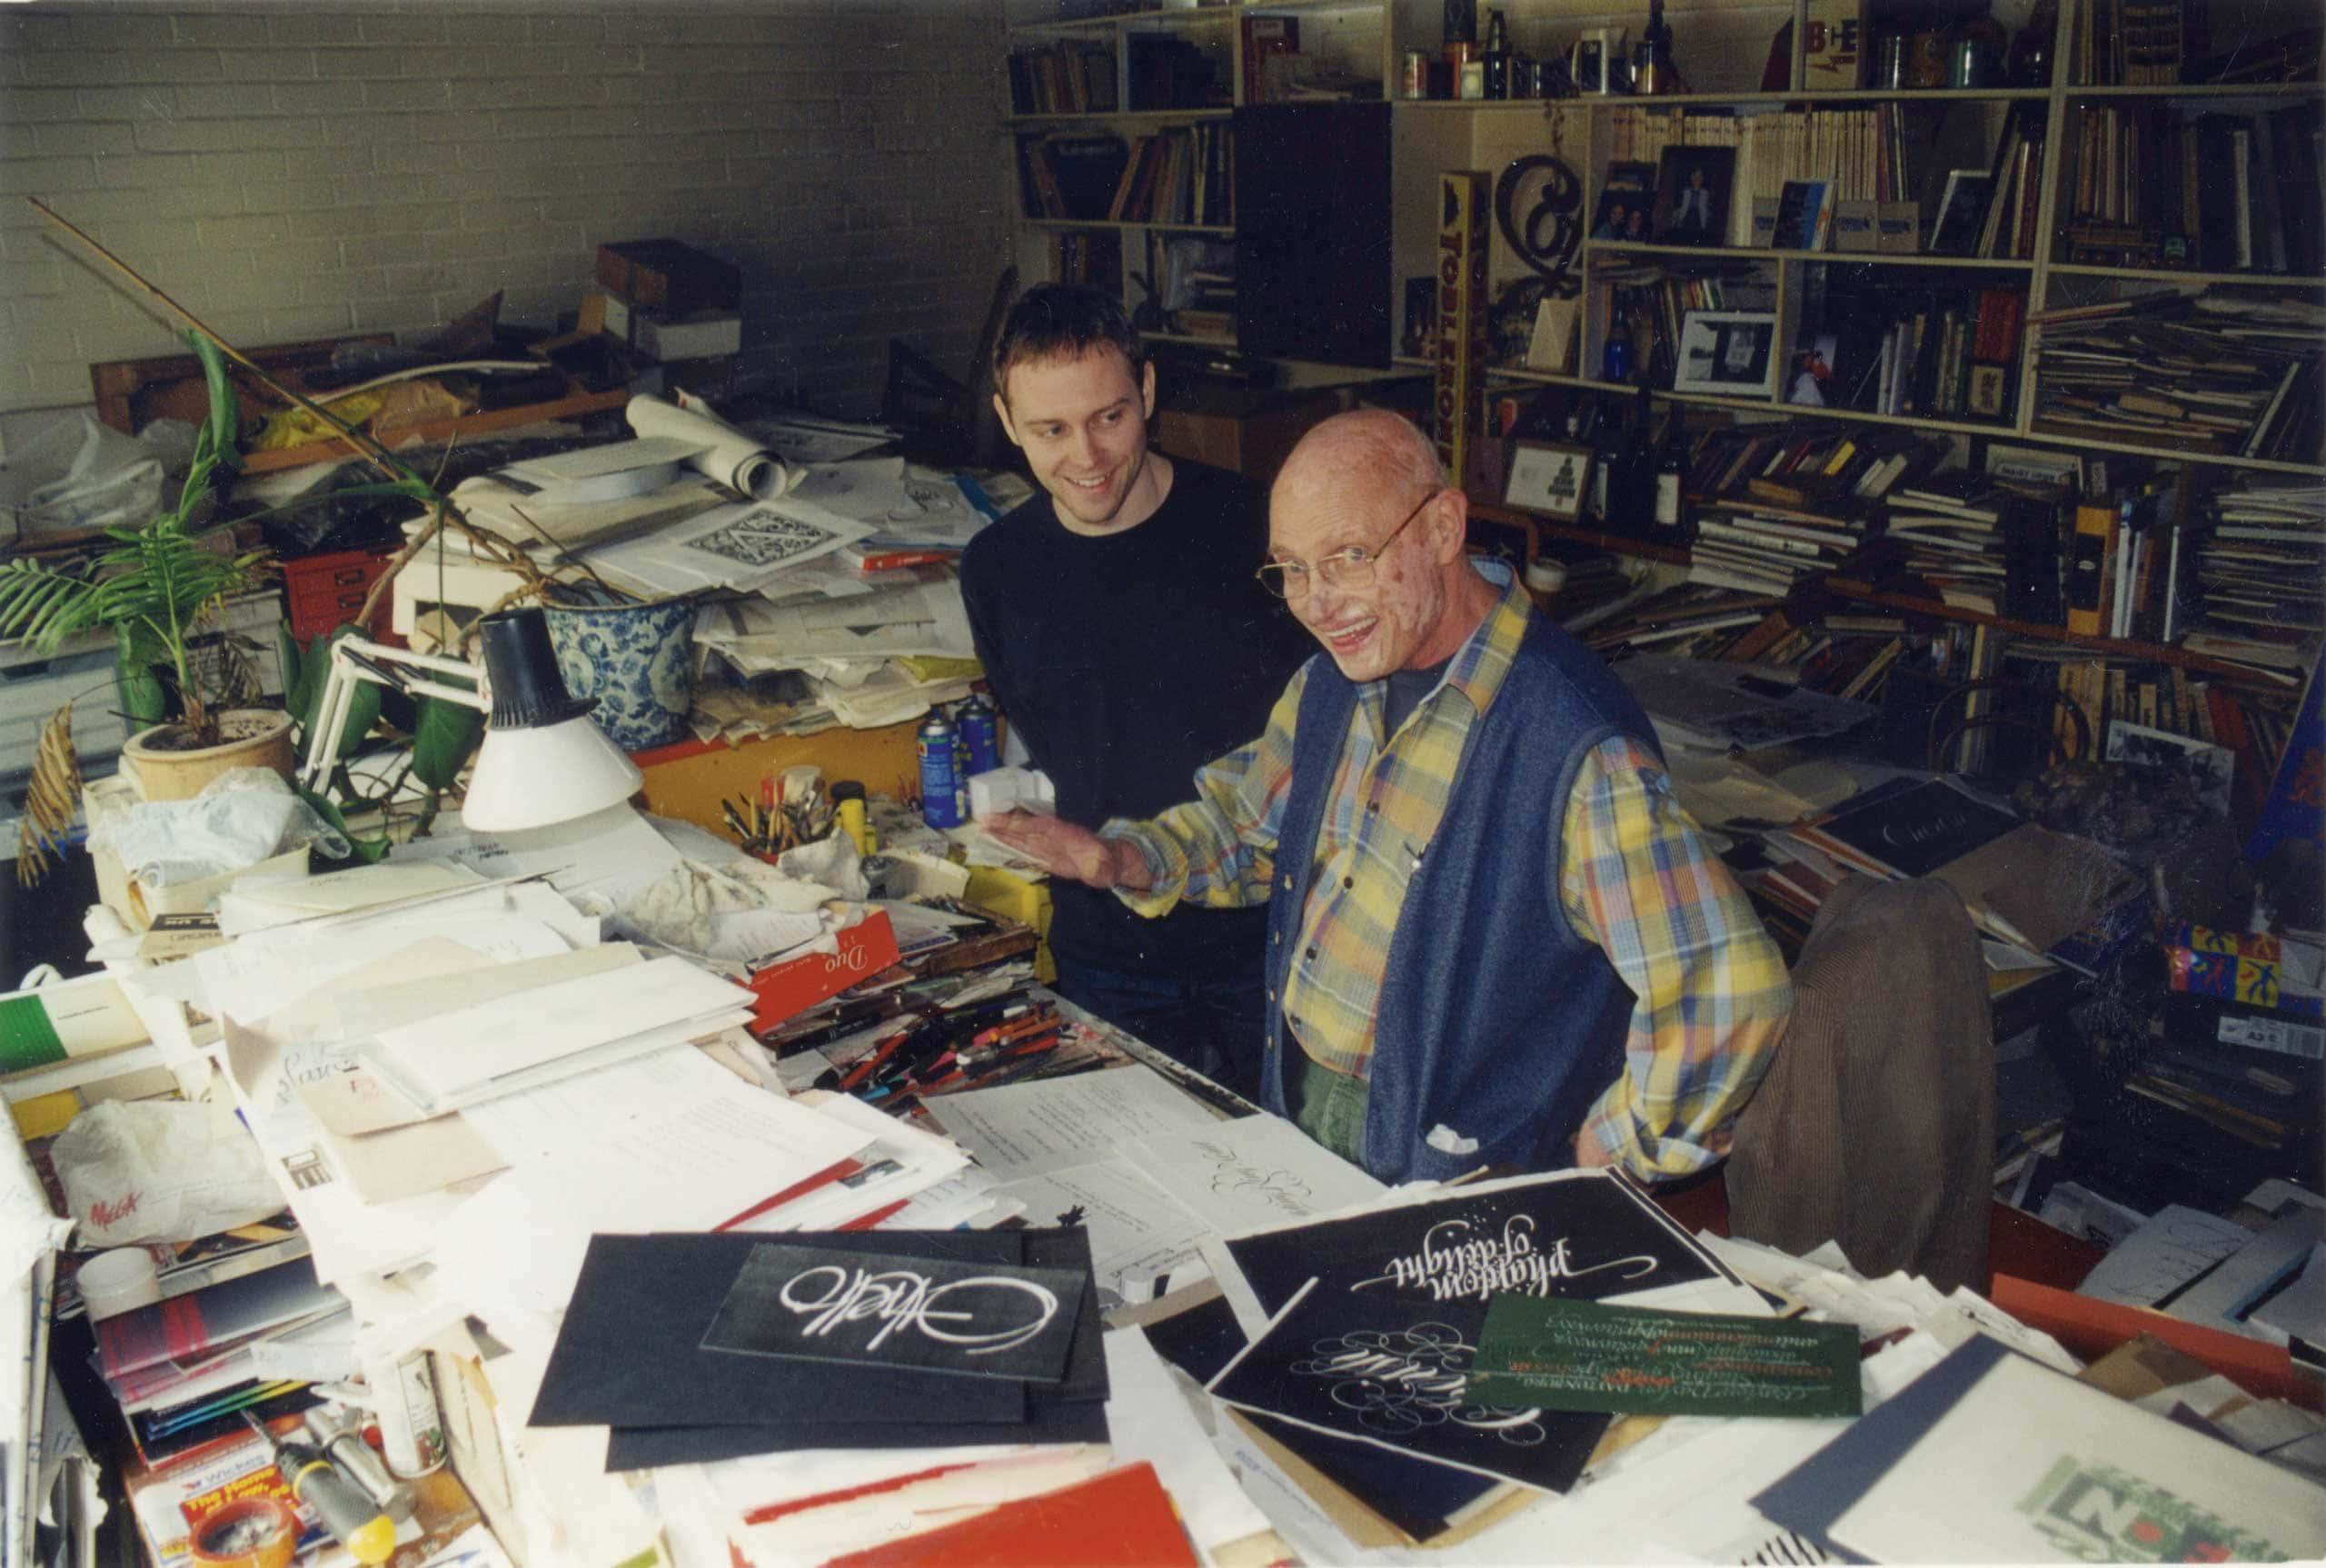 Dan + Tony in Tony's studio - Circa 2004